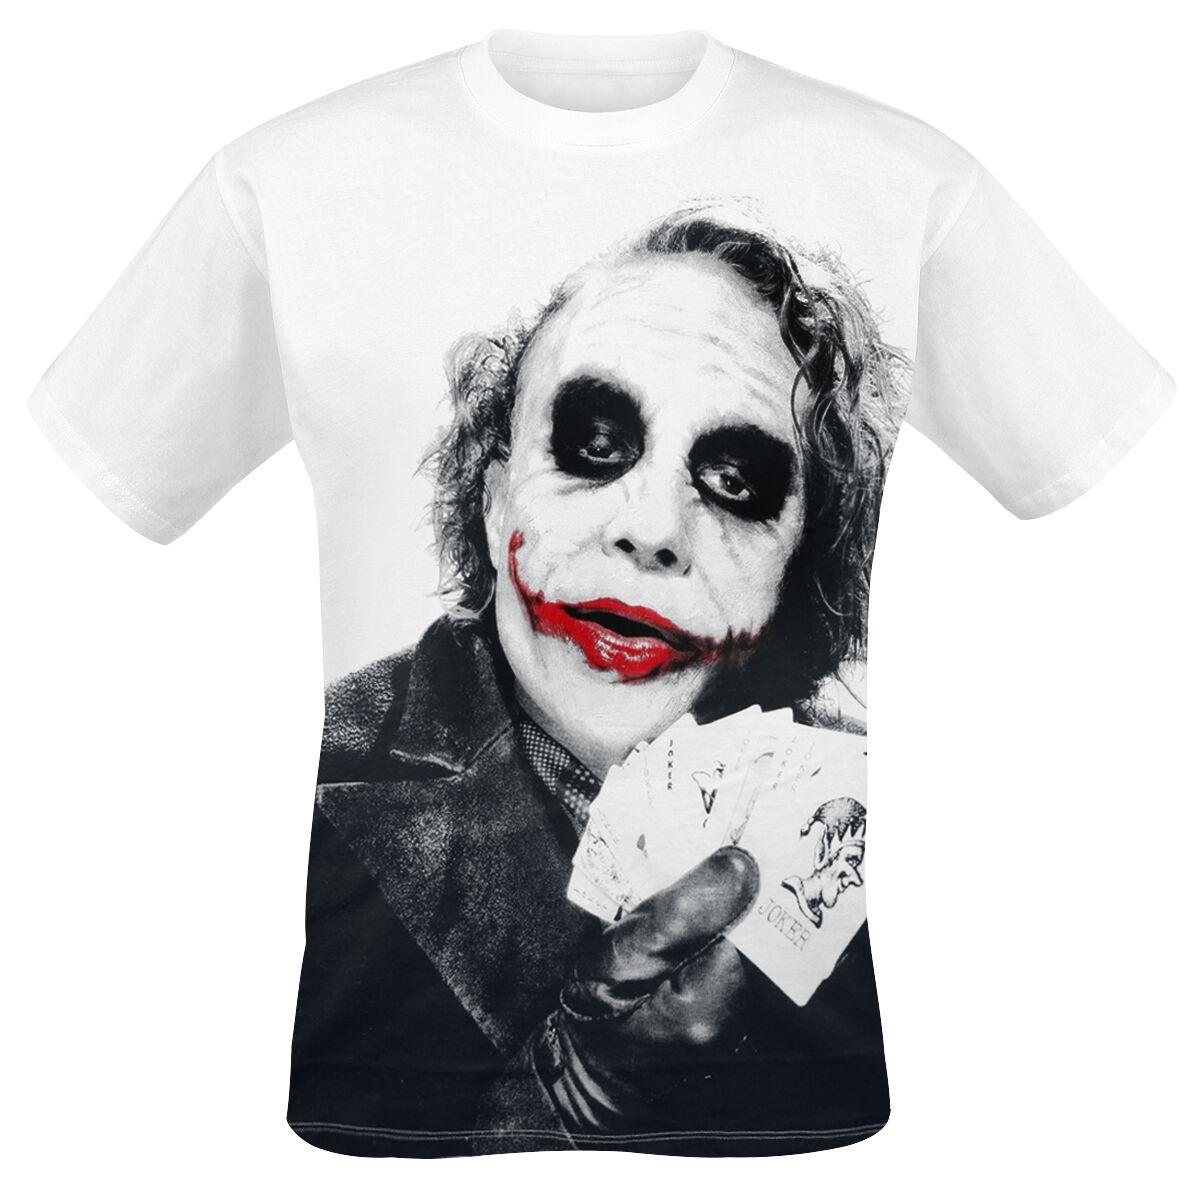 Merch dla Fanów - Koszulki - T-Shirt The Joker Joker Poker T-Shirt biały - 293888